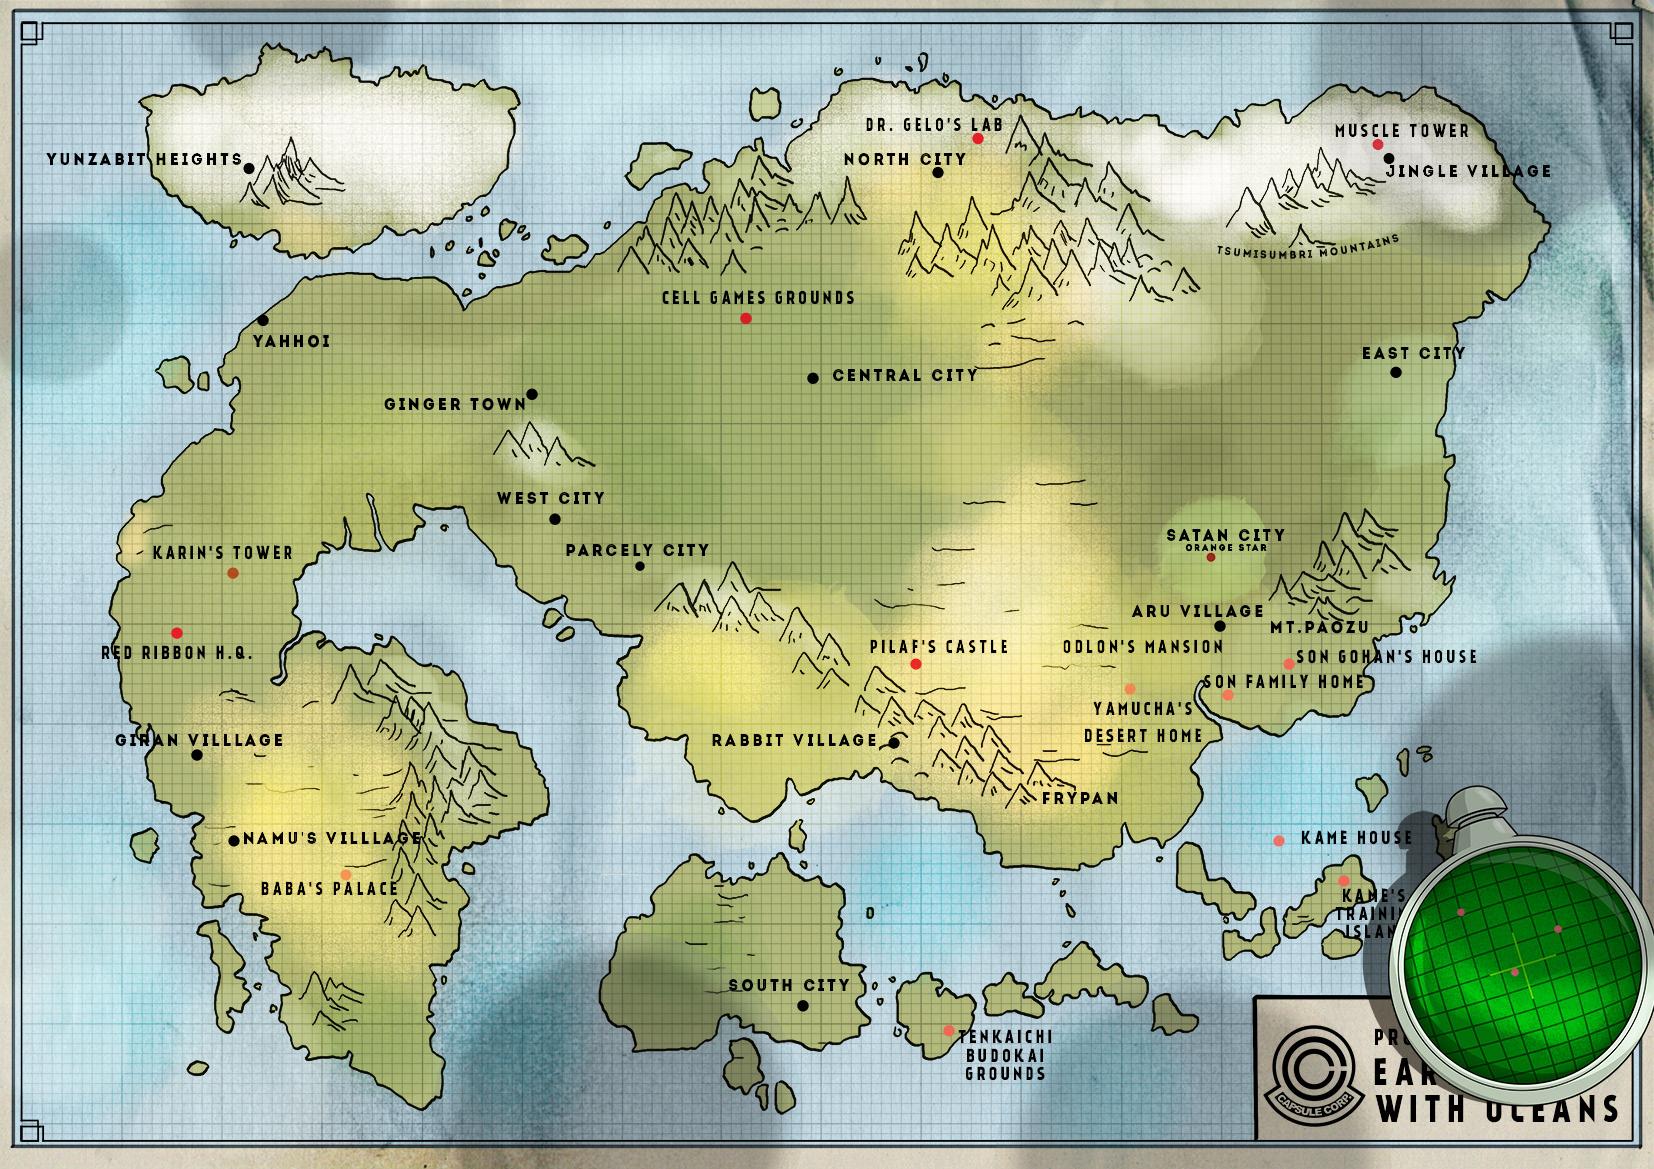 Andrea alemanno dragon ball map dragon ball map gumiabroncs Images